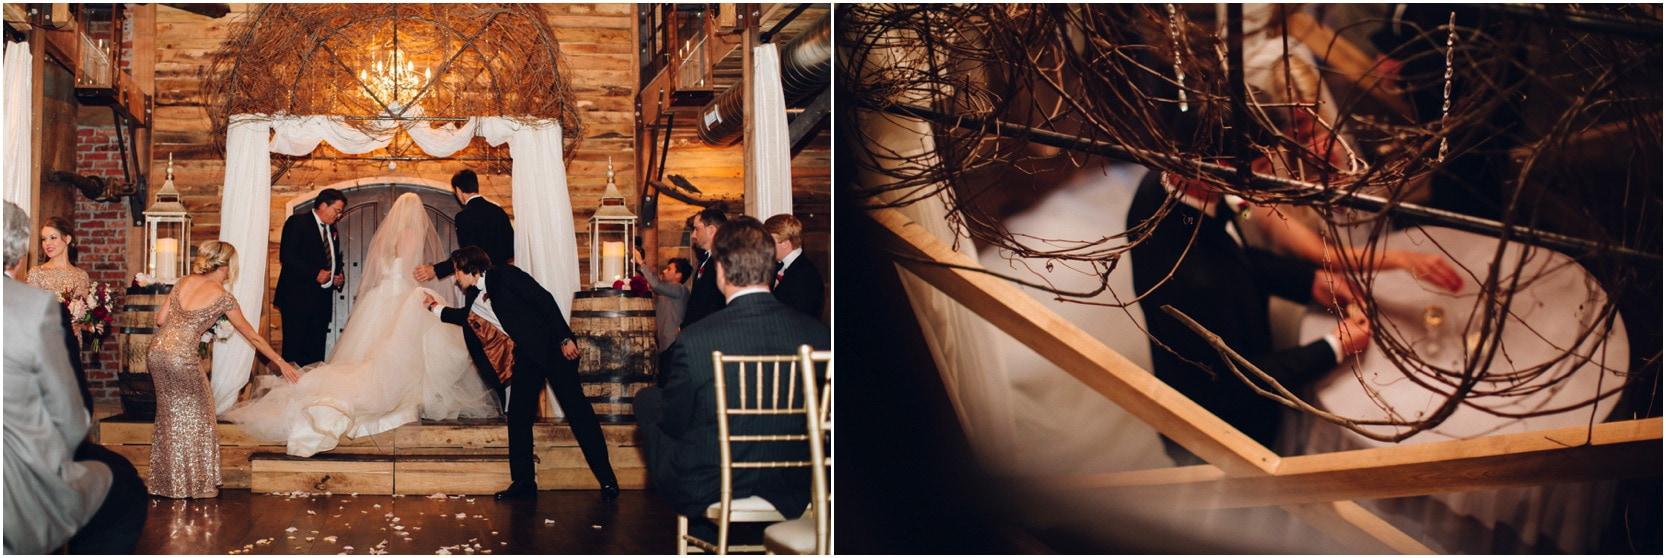 coderhillengburg_oklahoma_wedding__646_blogstomped